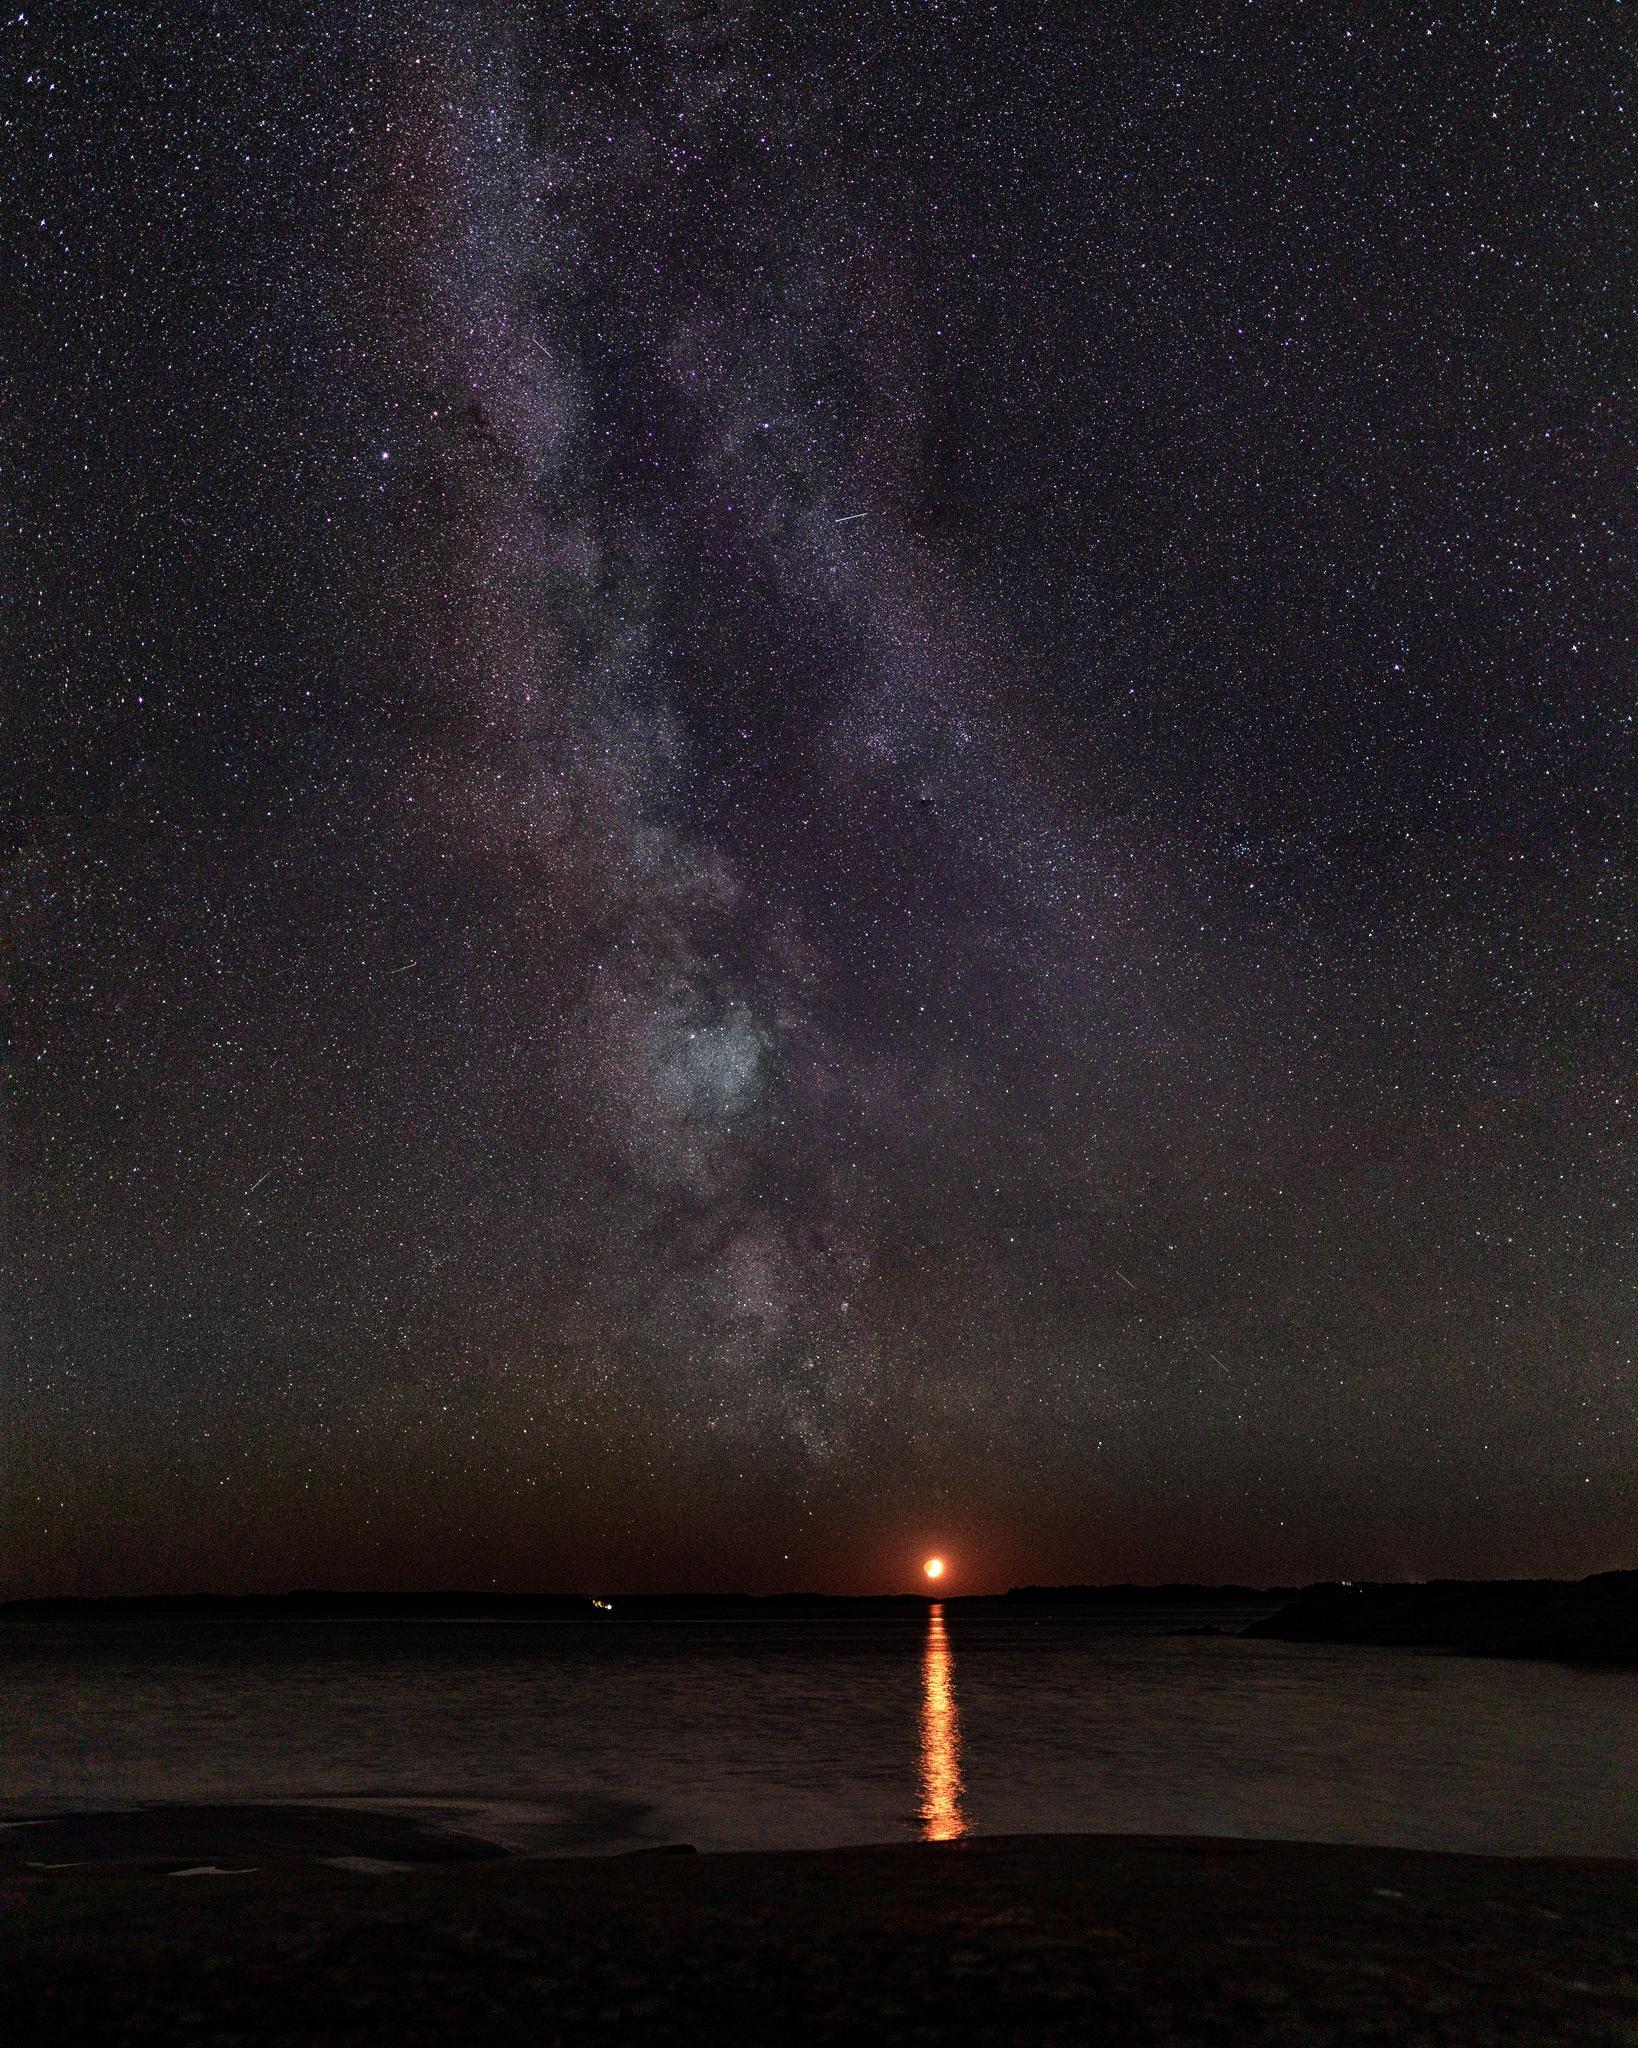 Moon setting the milky way by Petri Holländer